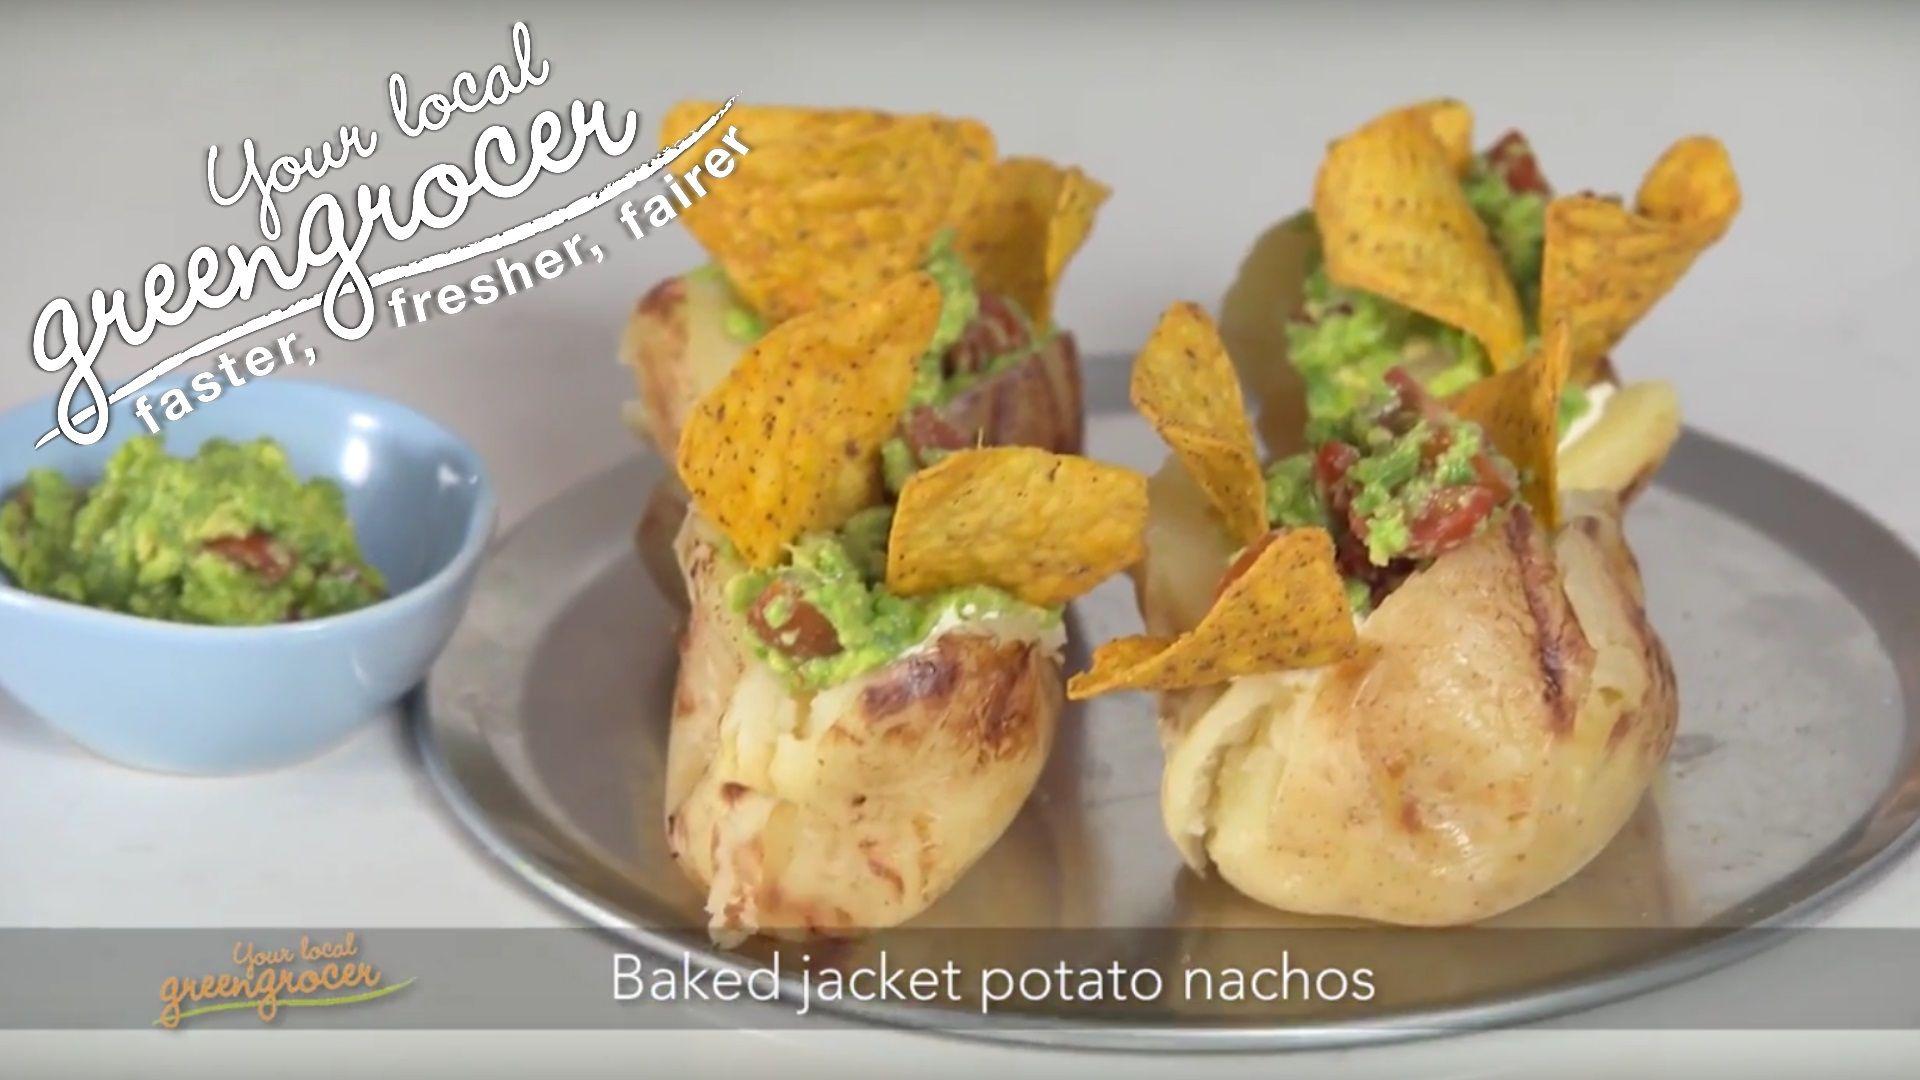 Related Posts:Tuna and Potato SaladSweet Potato Wedges Avocado…Potato, Dill, Bacon & EggSweet Potato and Bacon Spinach